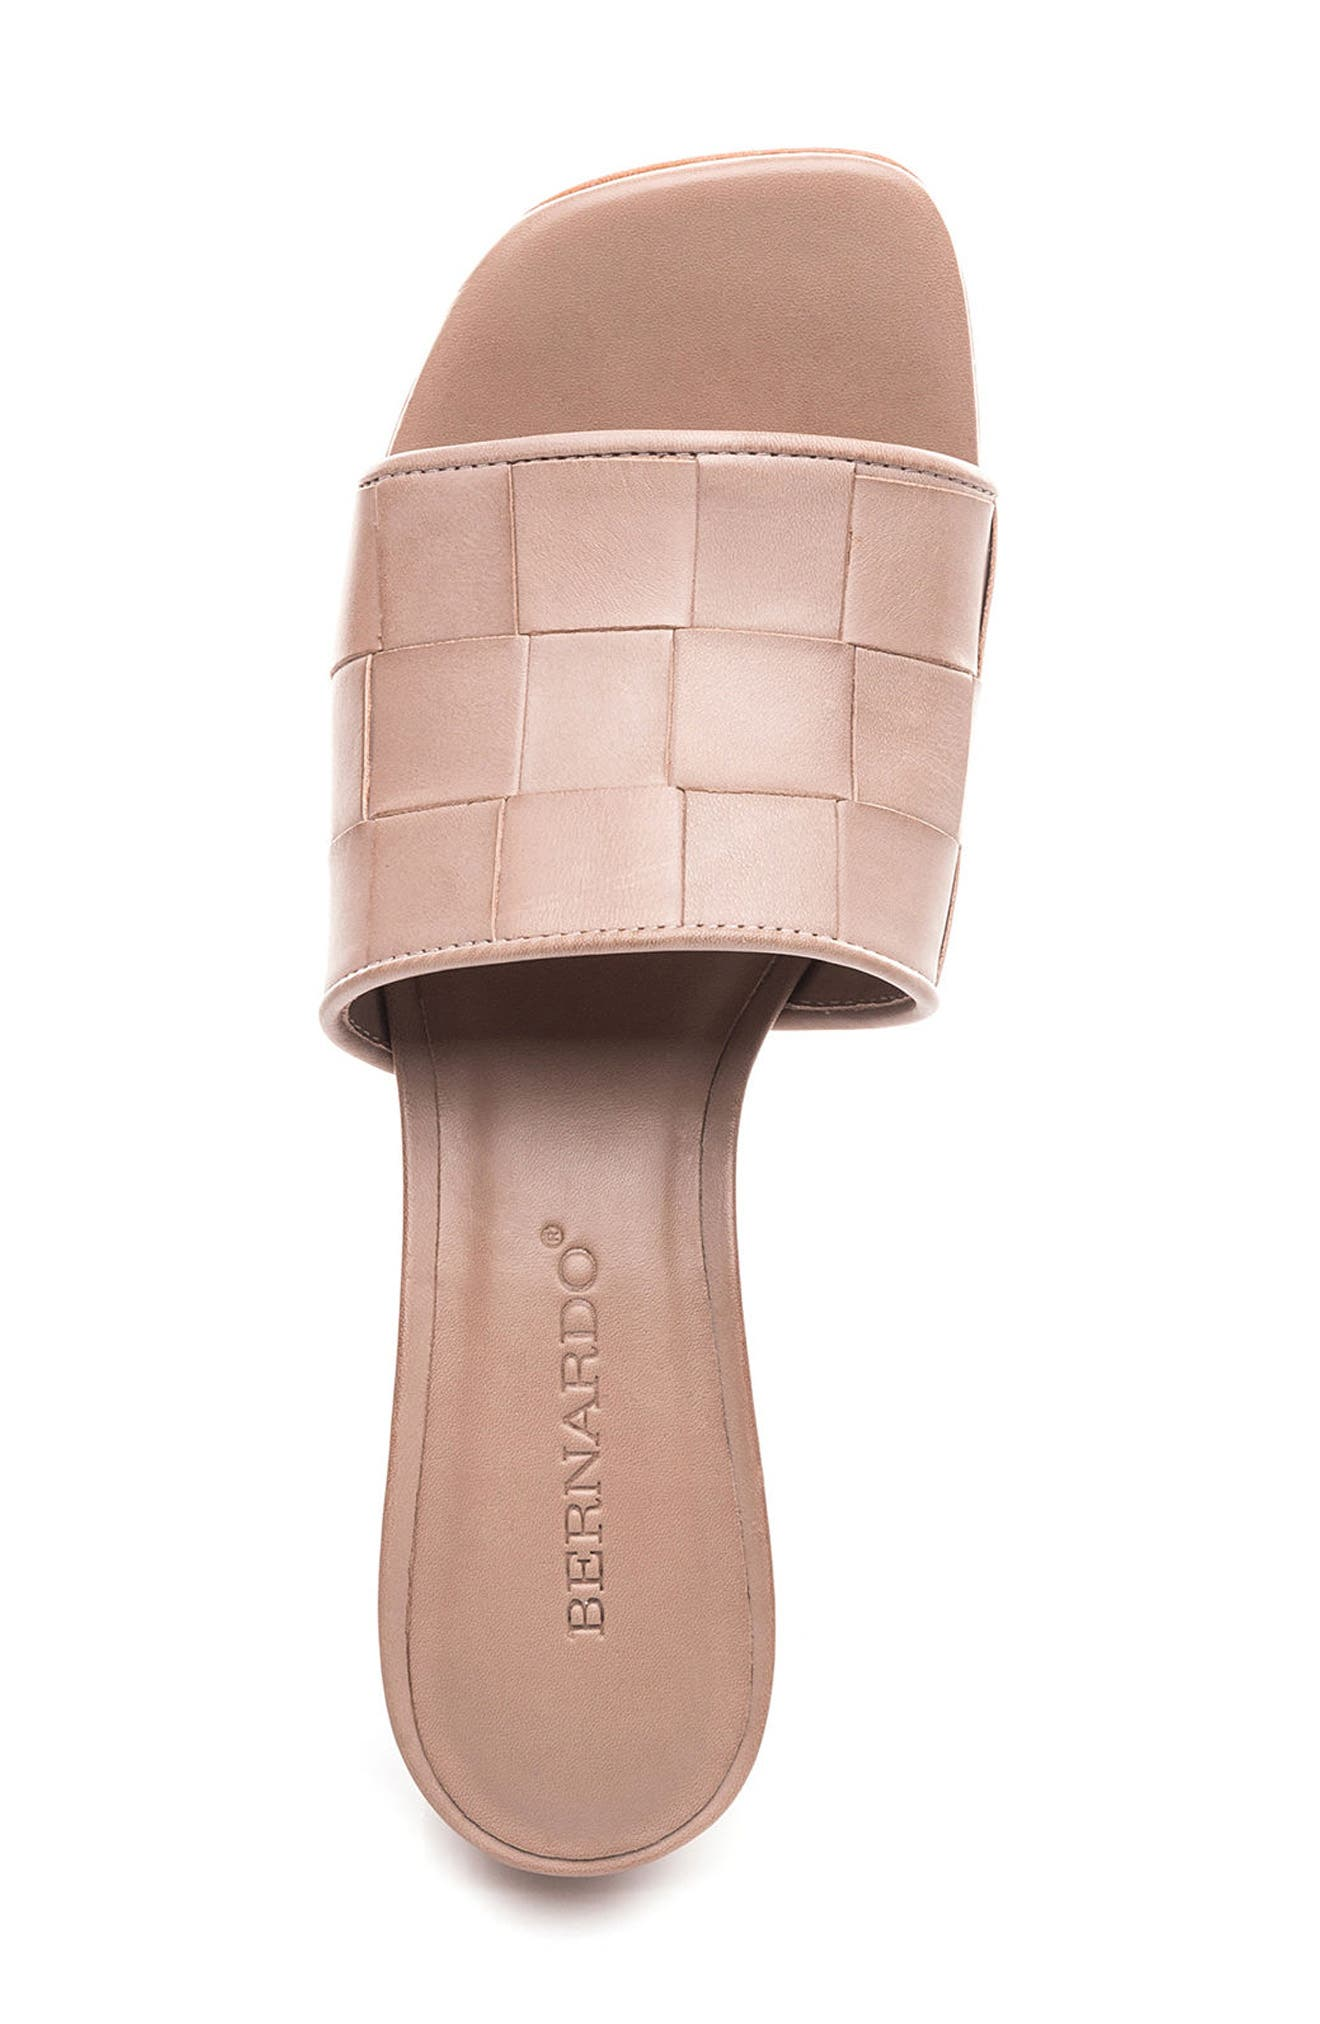 Bernardo Bridget Block Heel Sandal,                             Alternate thumbnail 18, color,